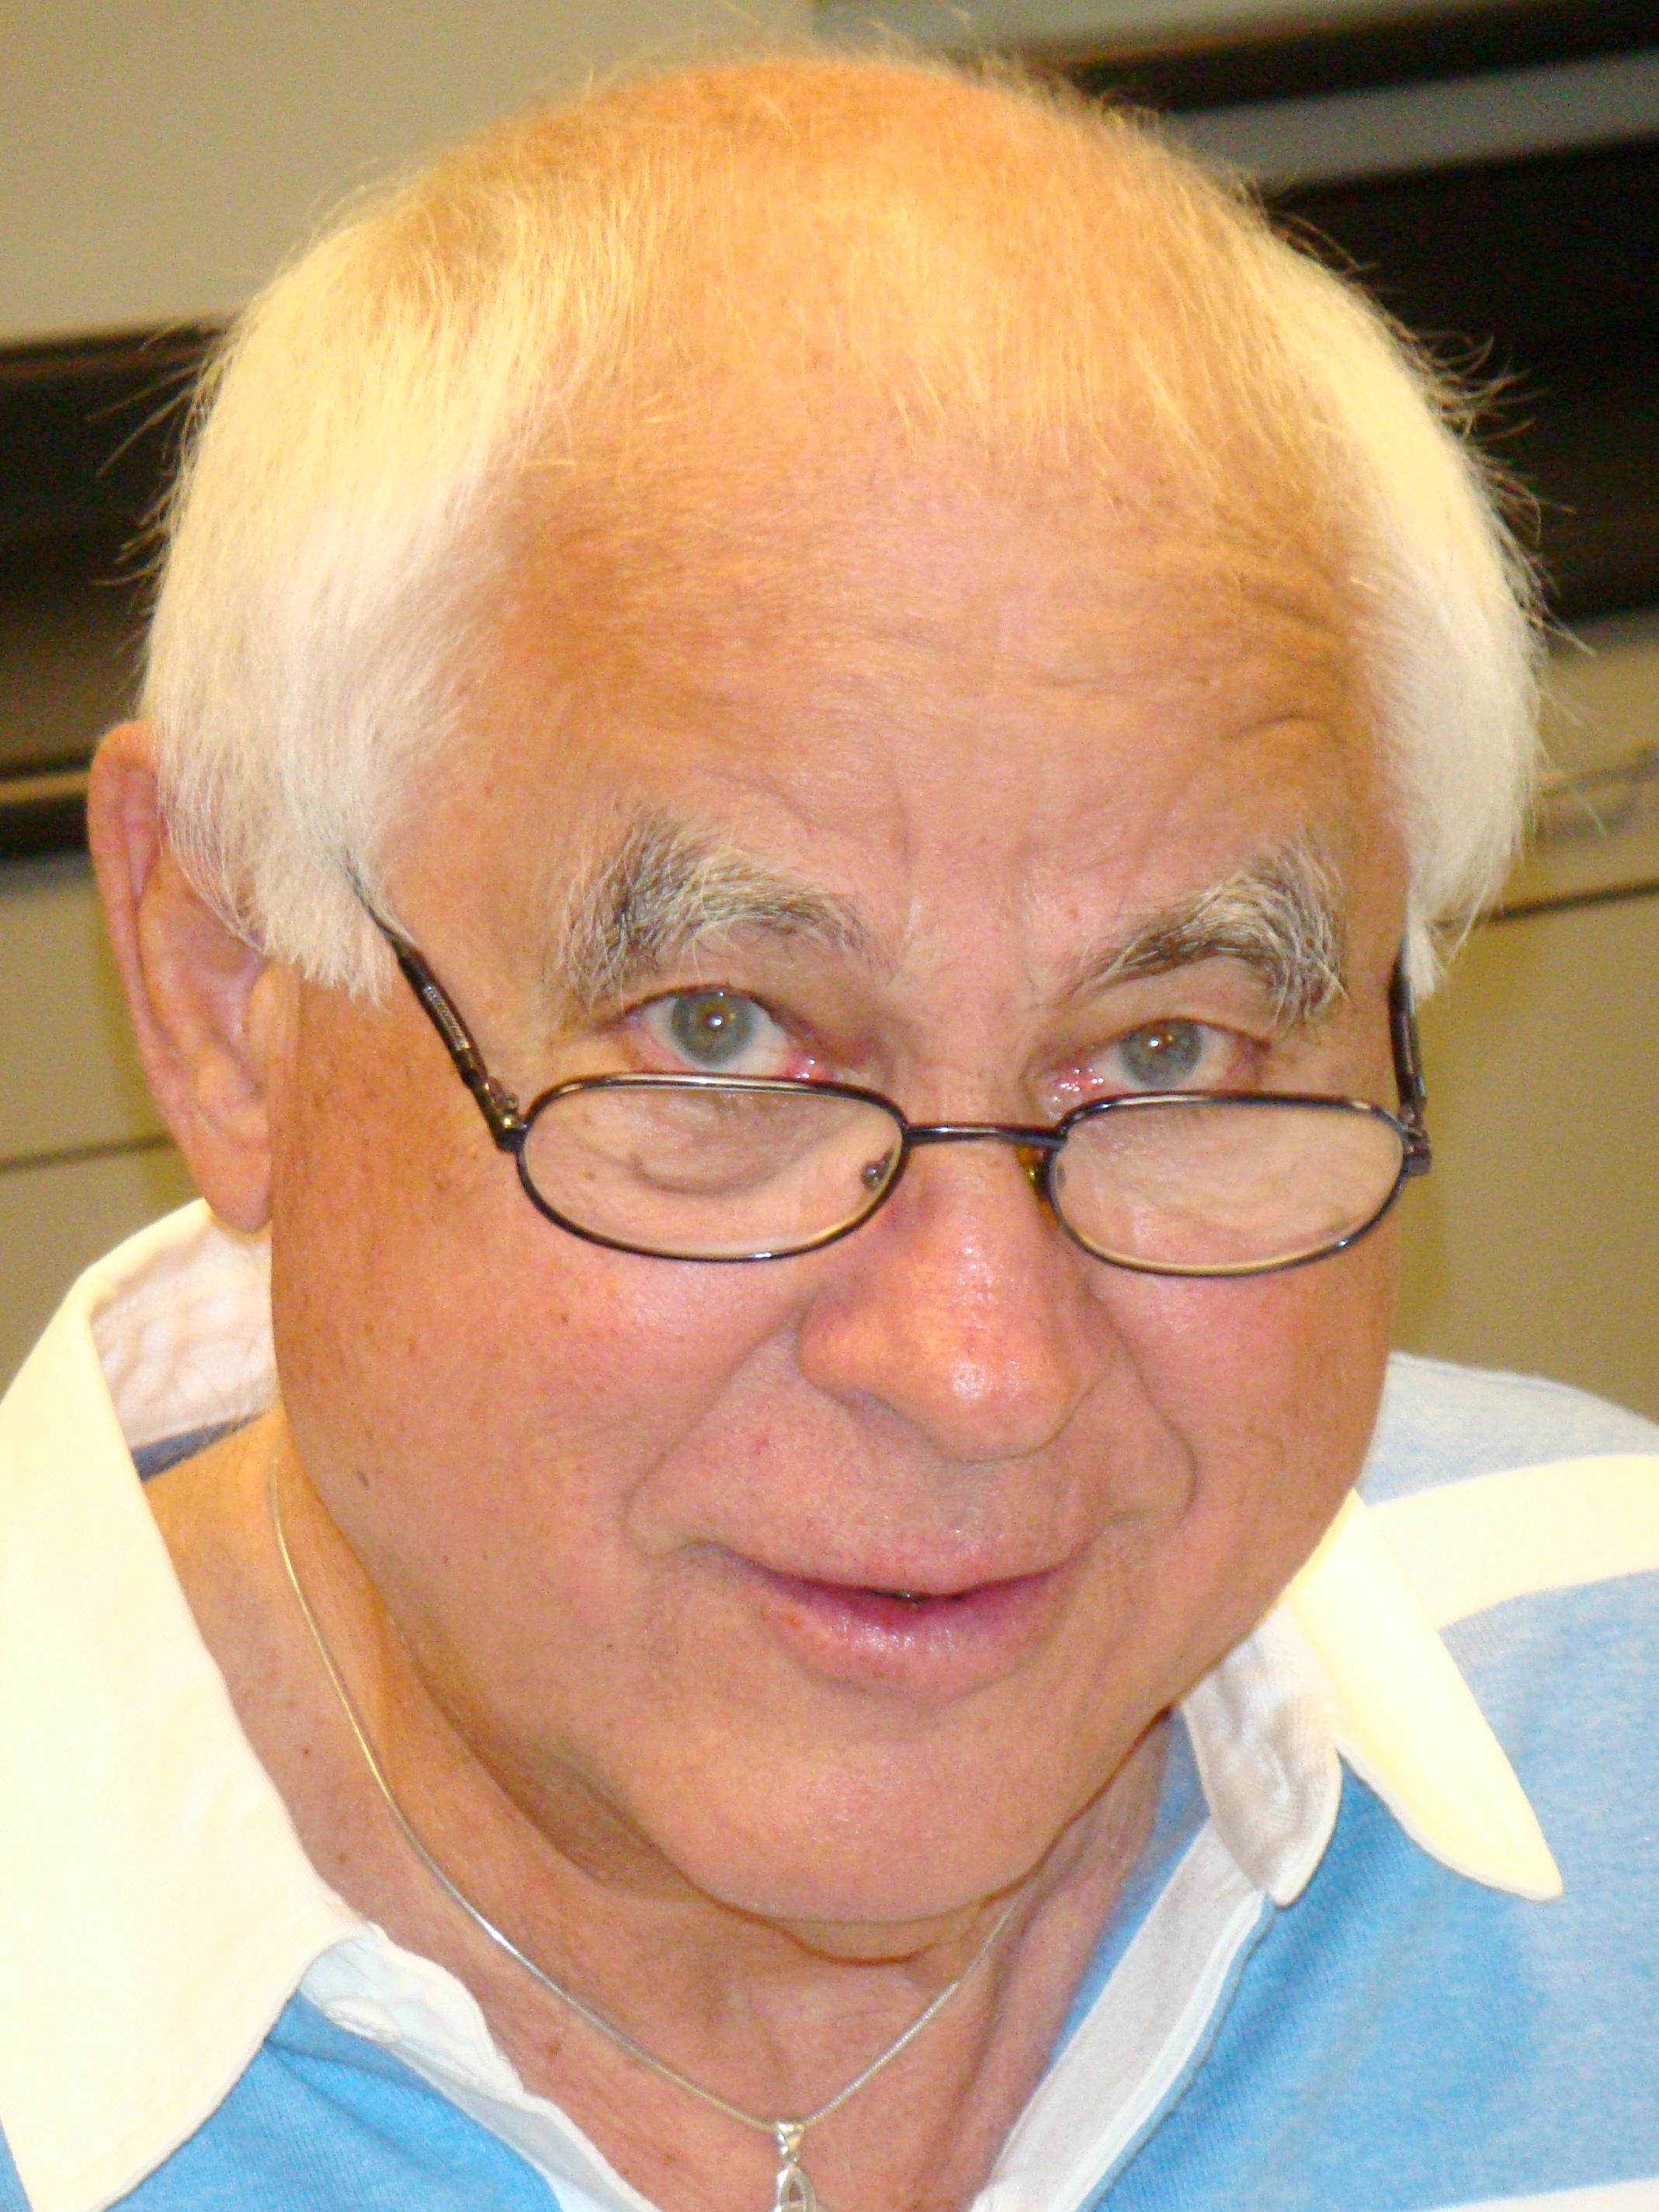 Bob Zoot